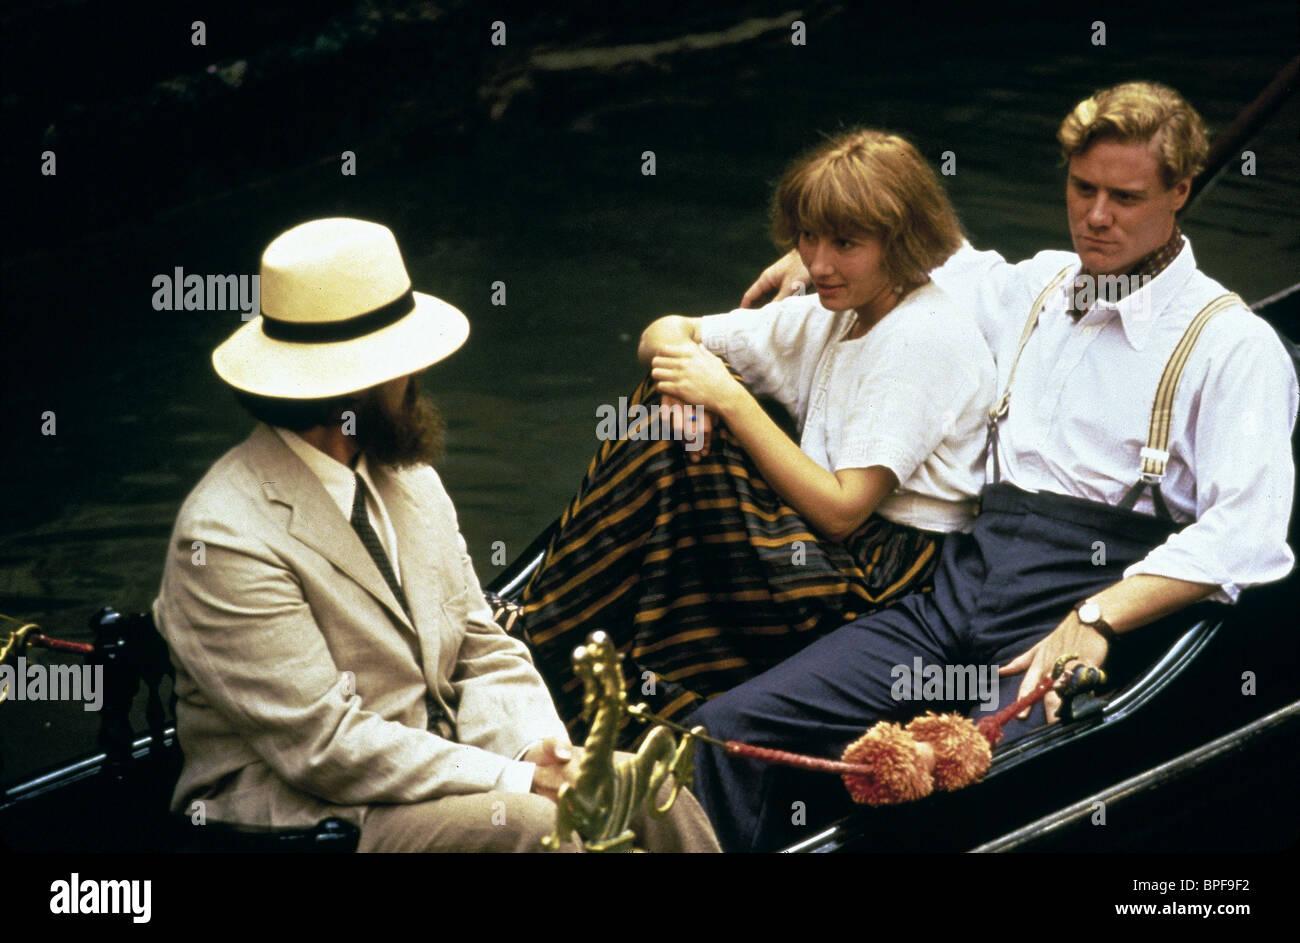 JONATHAN PRYCE, EMMA THOMPSON, STEVEN WADDINGTON, CARRINGTON, 1995 Stock Photo